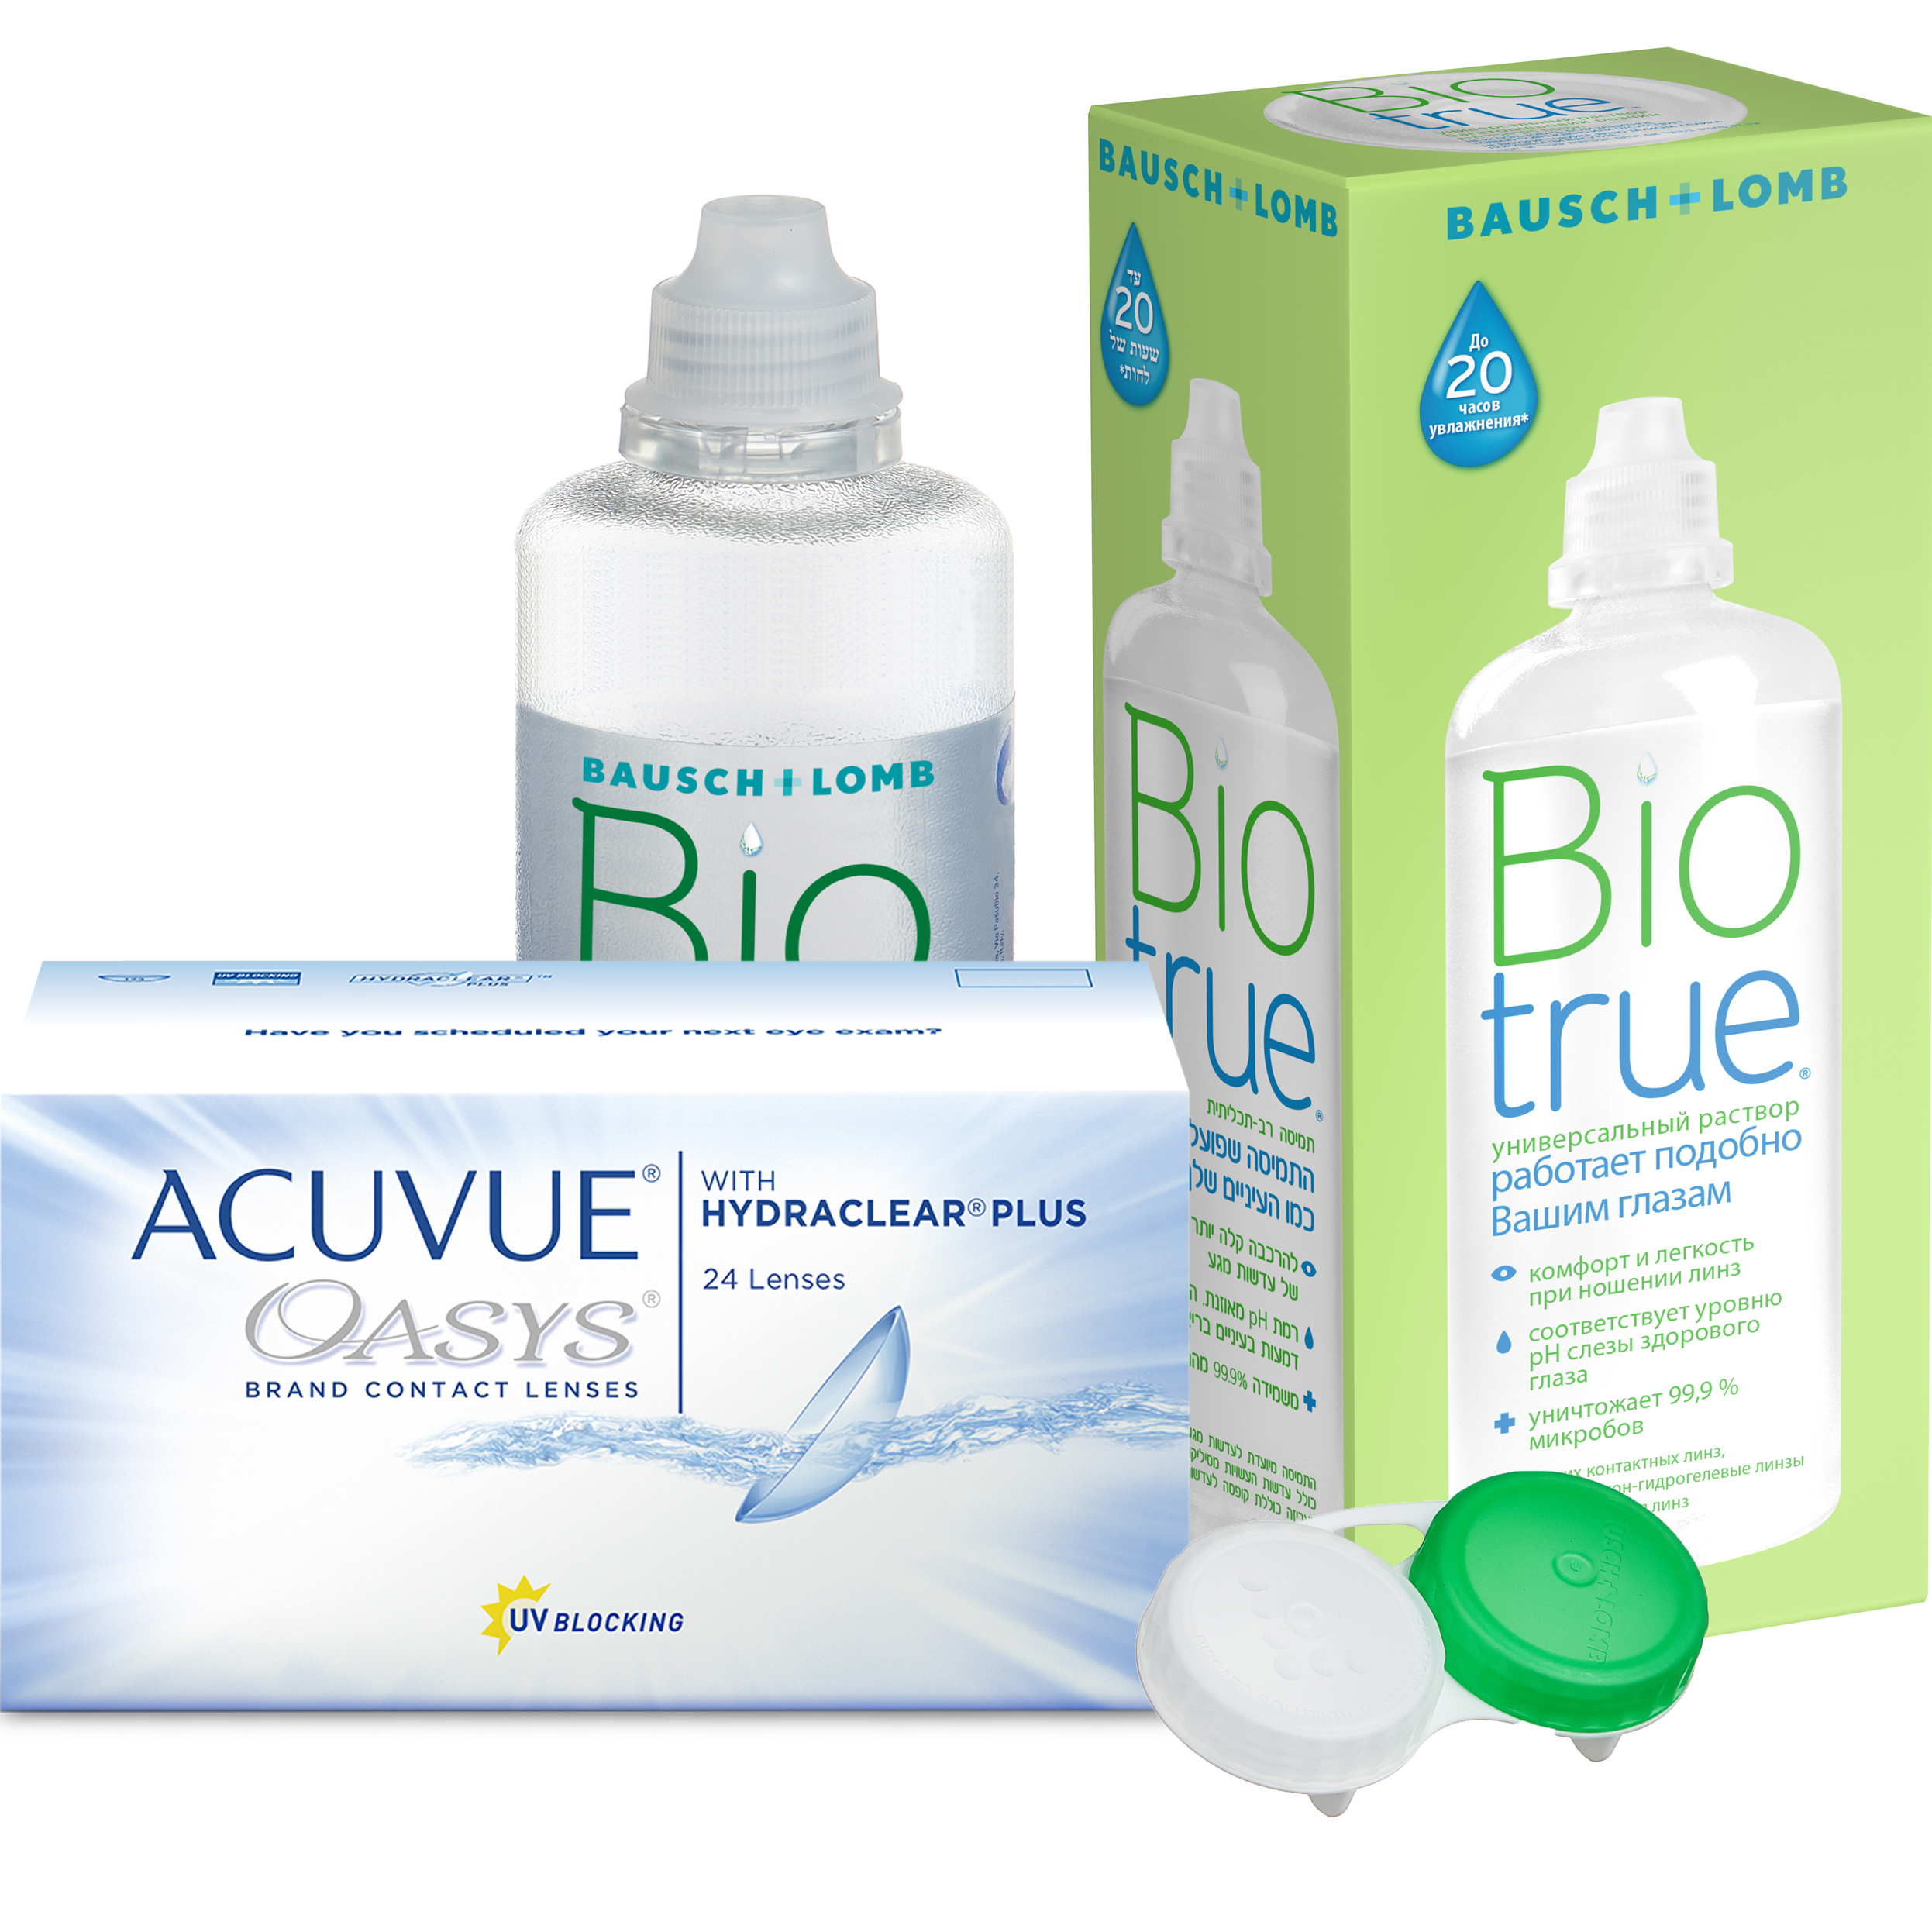 Купить Oasys with Hydraclear Plus 24 линзы + Biotrue, Контактные линзы Acuvue Oasys with Hydraclear Plus 24 линзы R 8.8 -11, 00 + Biotrue 300 мл